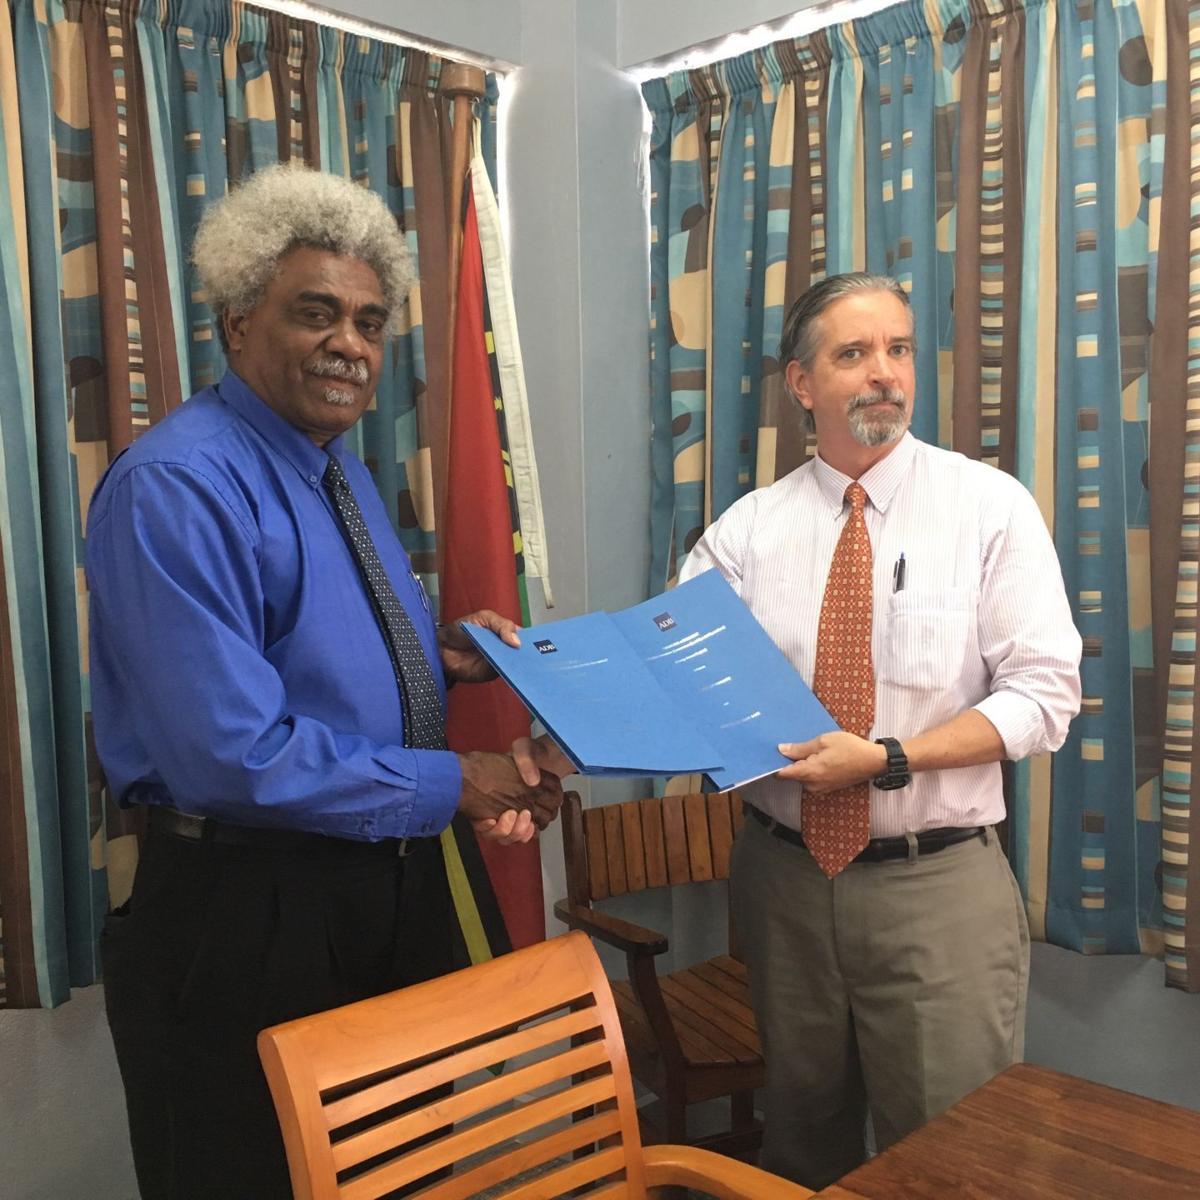 ADB and Vanuatu sign agreement to boost renewable energy access